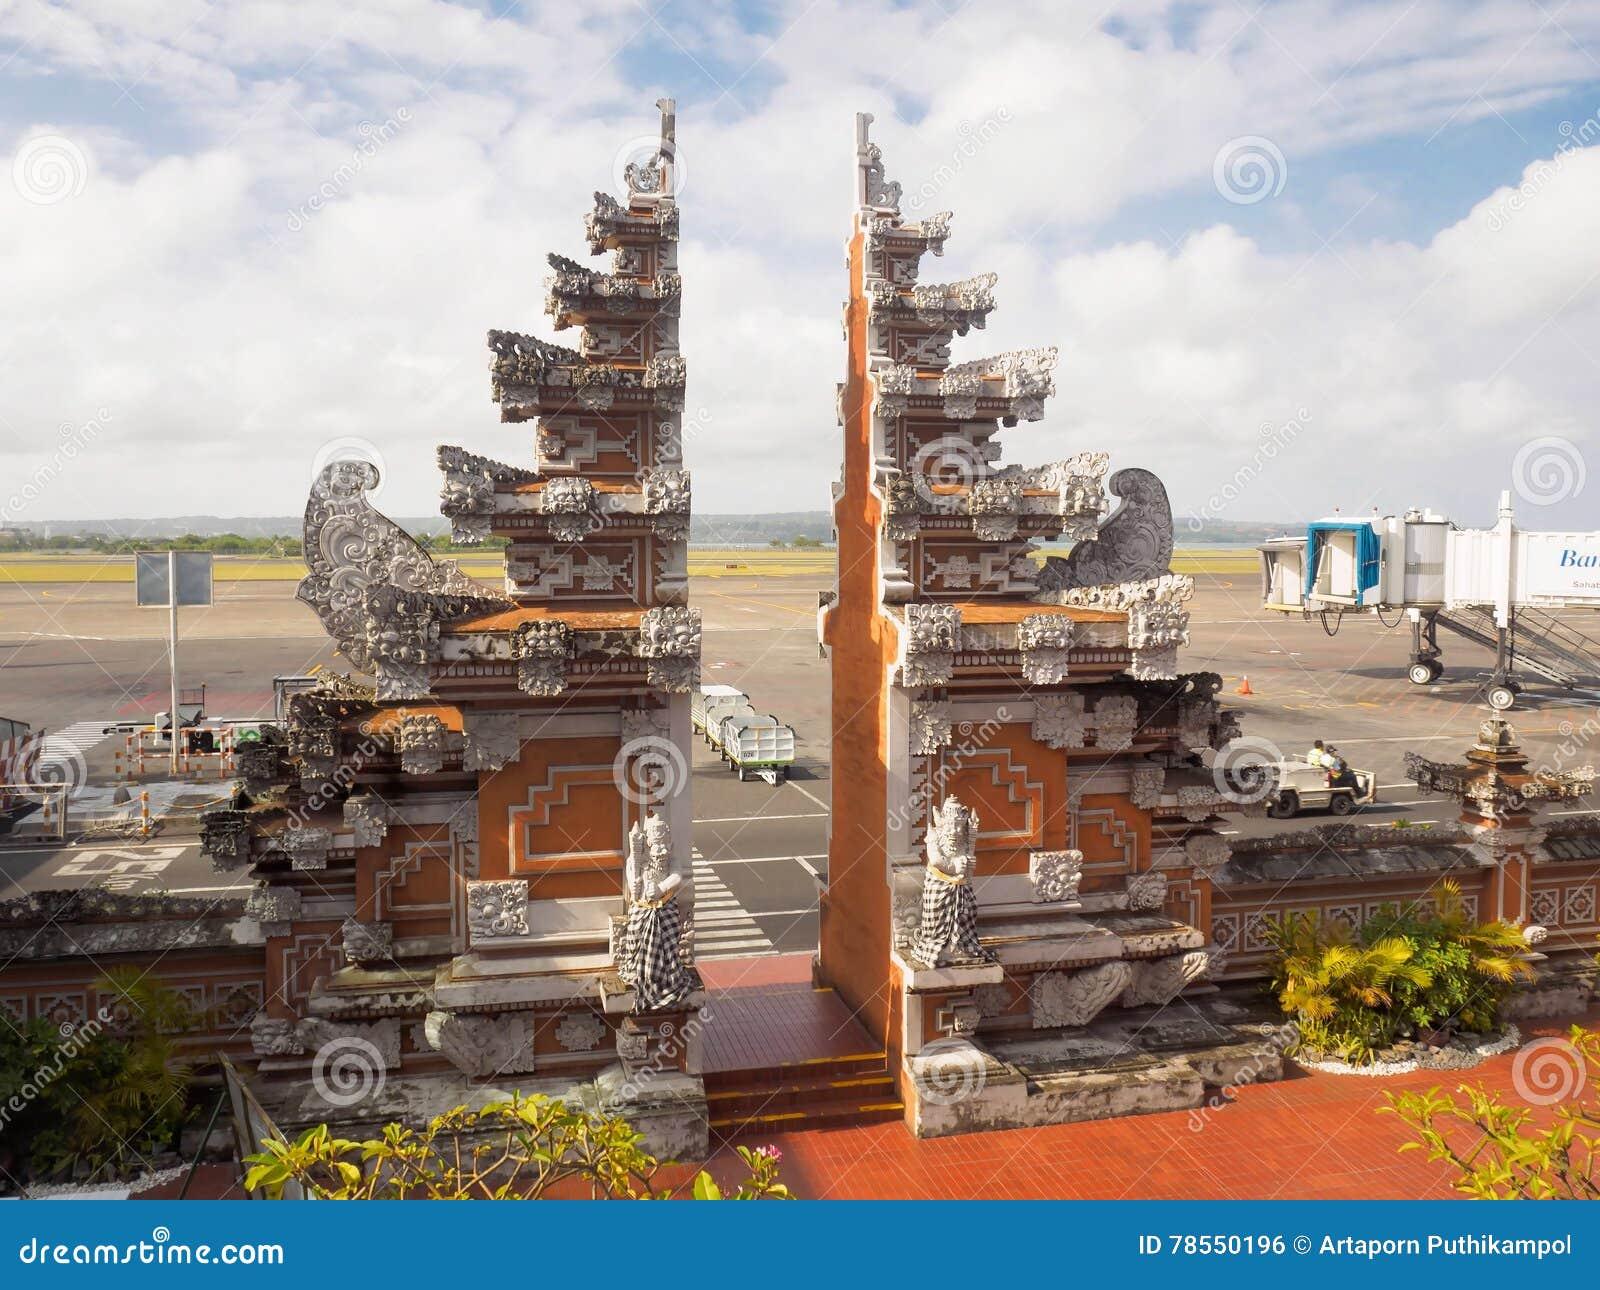 Aeroporto Denpasar : Aeroporto internazionale di denpasar bali indonesia